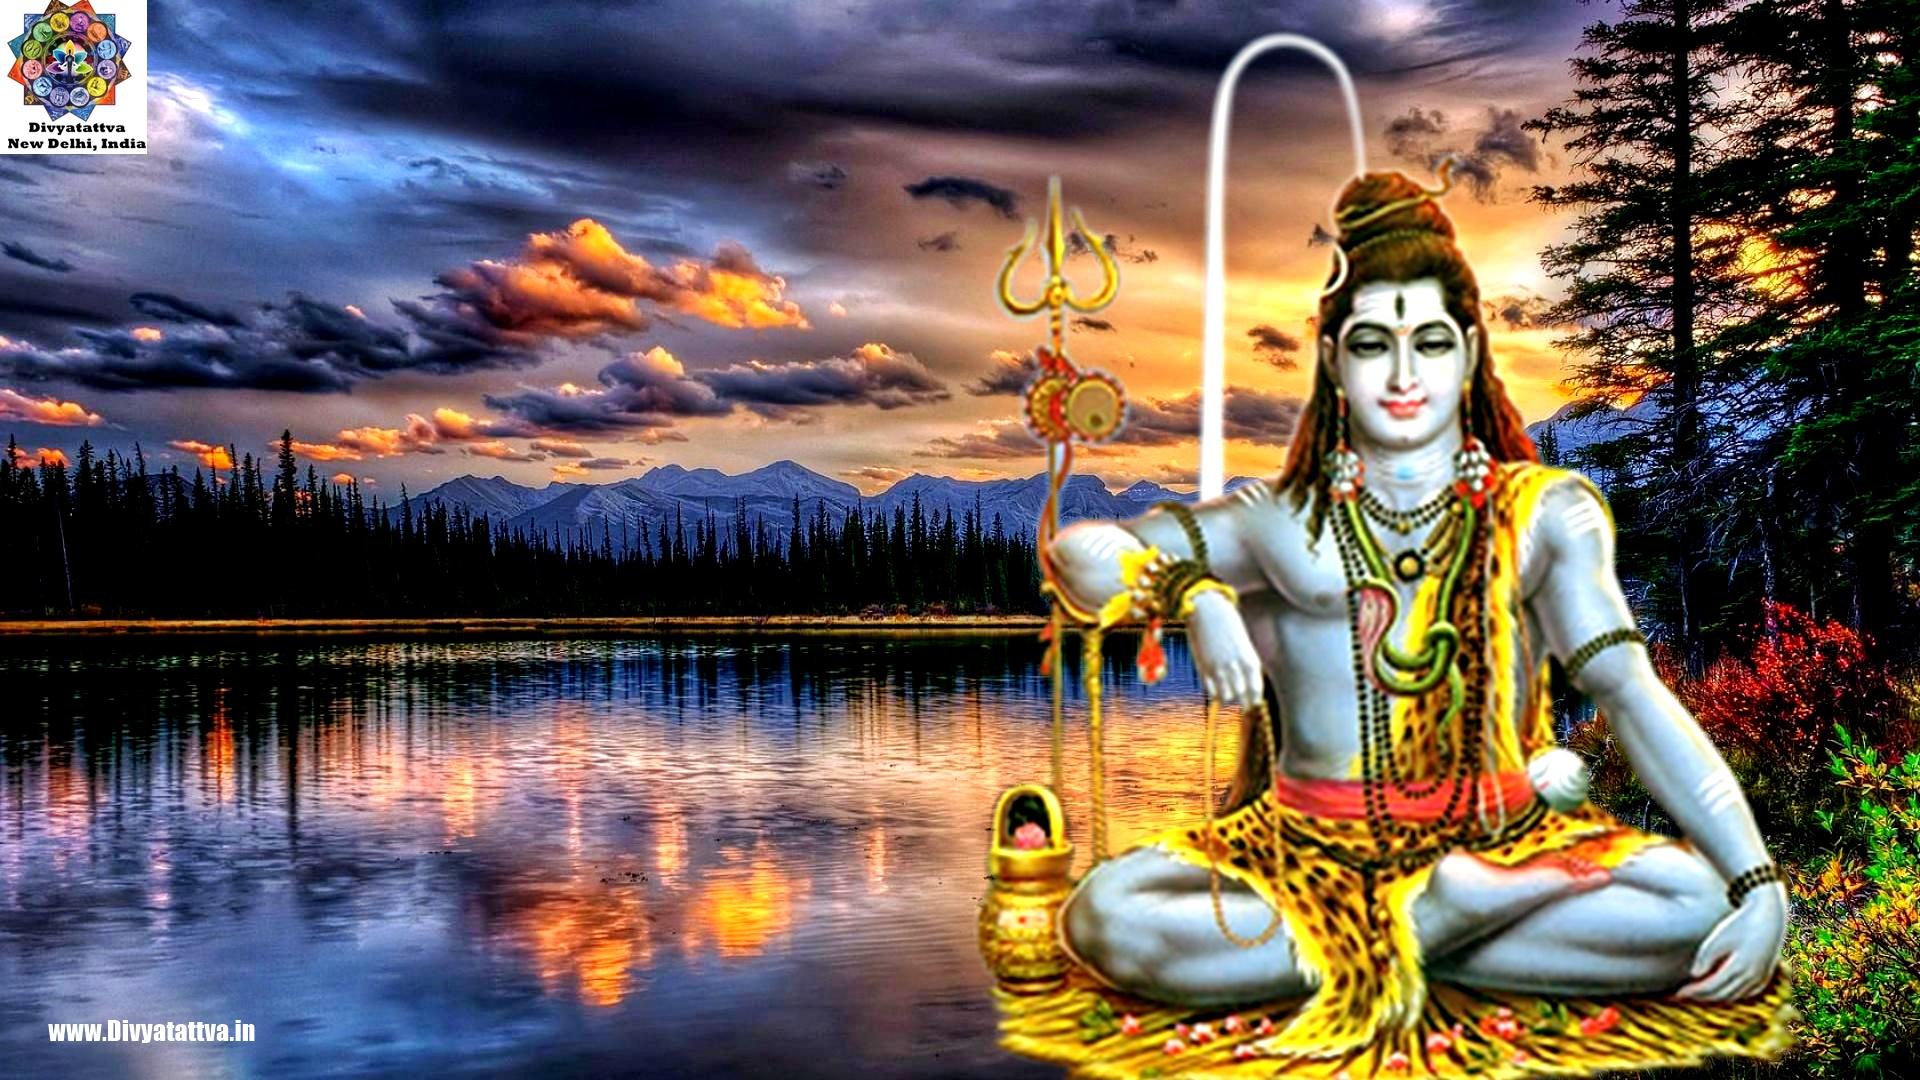 divyatattva astrology free horoscopes psychic tarot yoga tantra occult images videos lord shiva hd backgrounds siva meditation wallpaper hindu god mahadev in samadhi lord shiva hd backgrounds siva